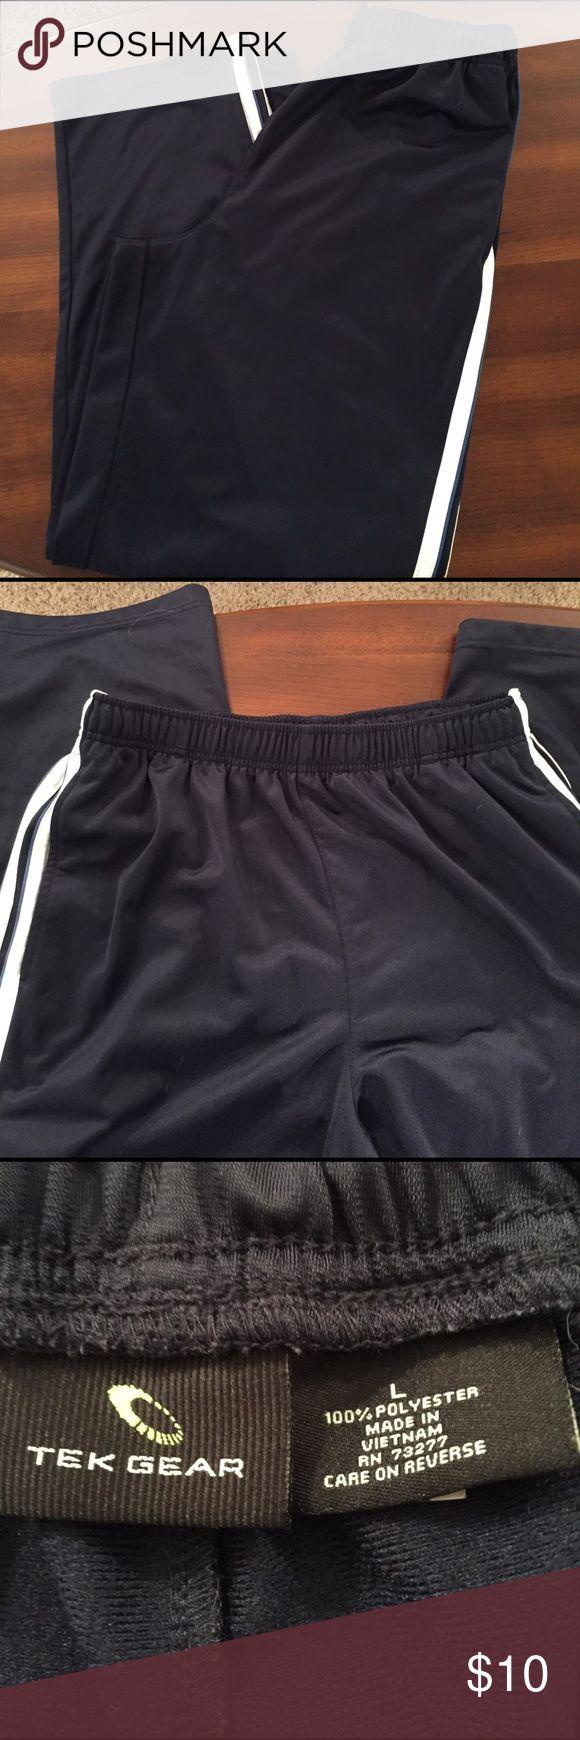 Men's workout pants Men's athletic workout pants.  Worn once, navy blue with white stripes down each side.  Elastic waist. Tekgear Pants Sweatpants & Joggers